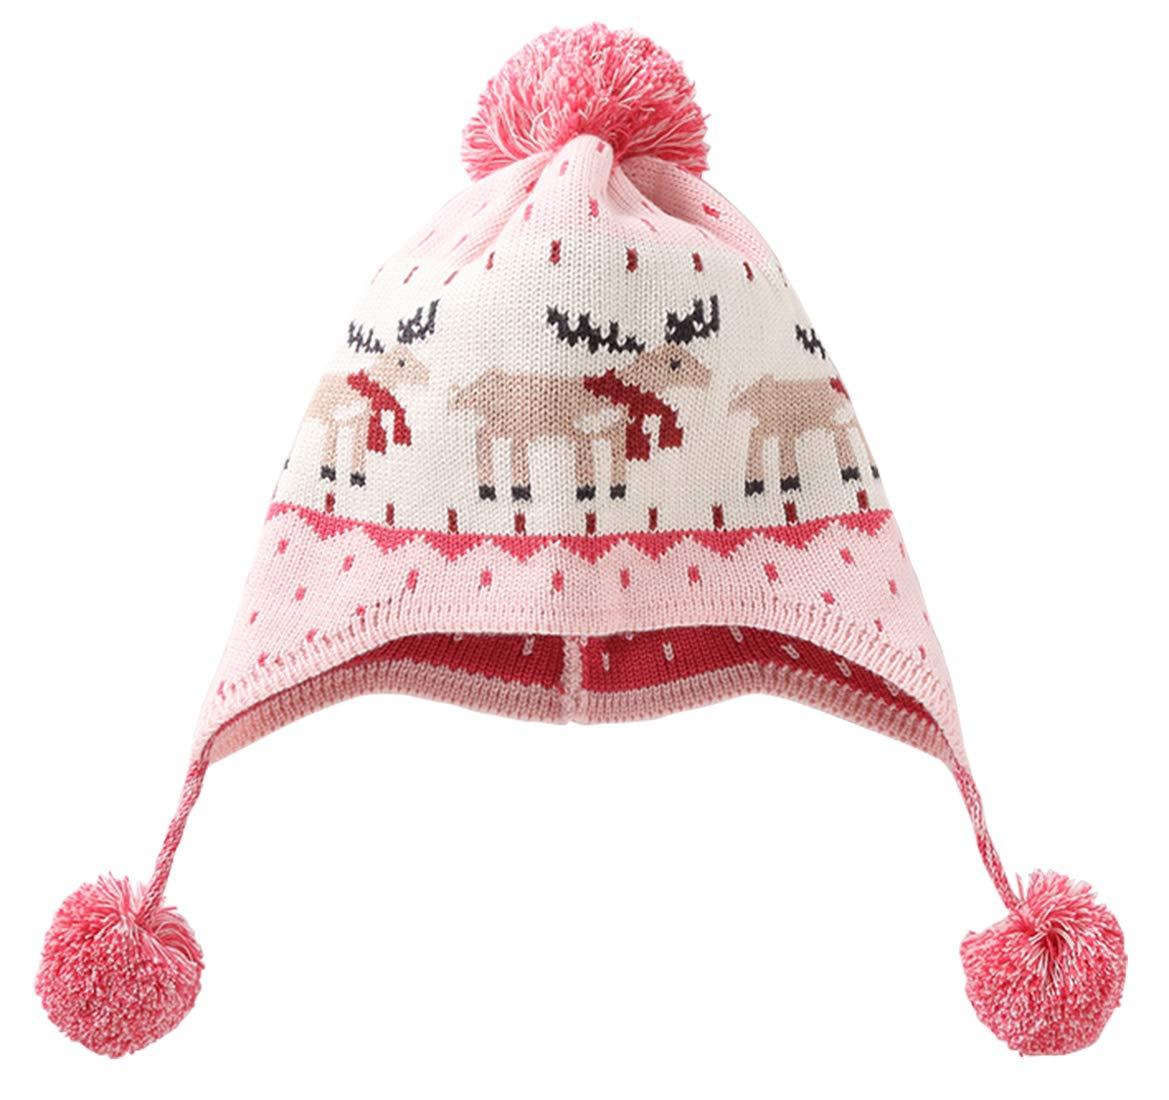 85405cdd80962 RUHI Crochet Baby Beanie Earflaps Cap Little Girl Boy Knit Deer Jacquard Hats  Winter Warm Cap Lined Polyester Pink for Christmas 4-8T